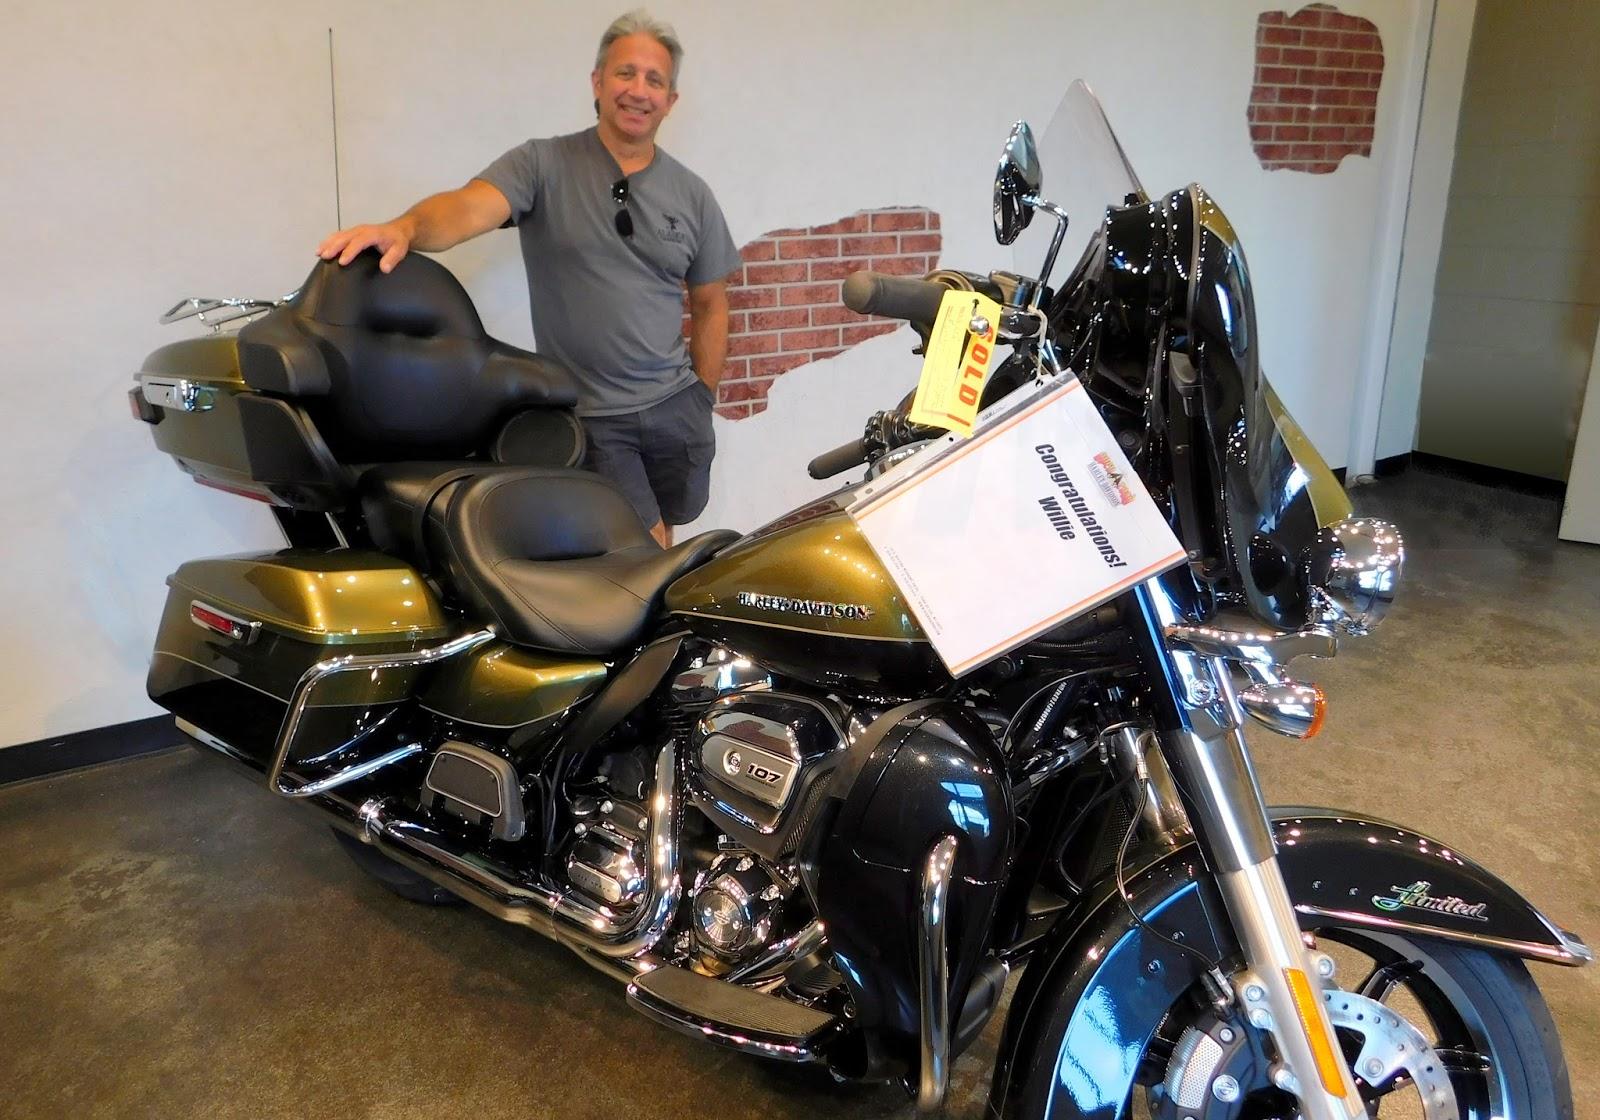 Harley Davidson Dealers In Wisconsin Map.Open Road Blog Open Road Harley Davidson Fond Du Lac Wisconsin